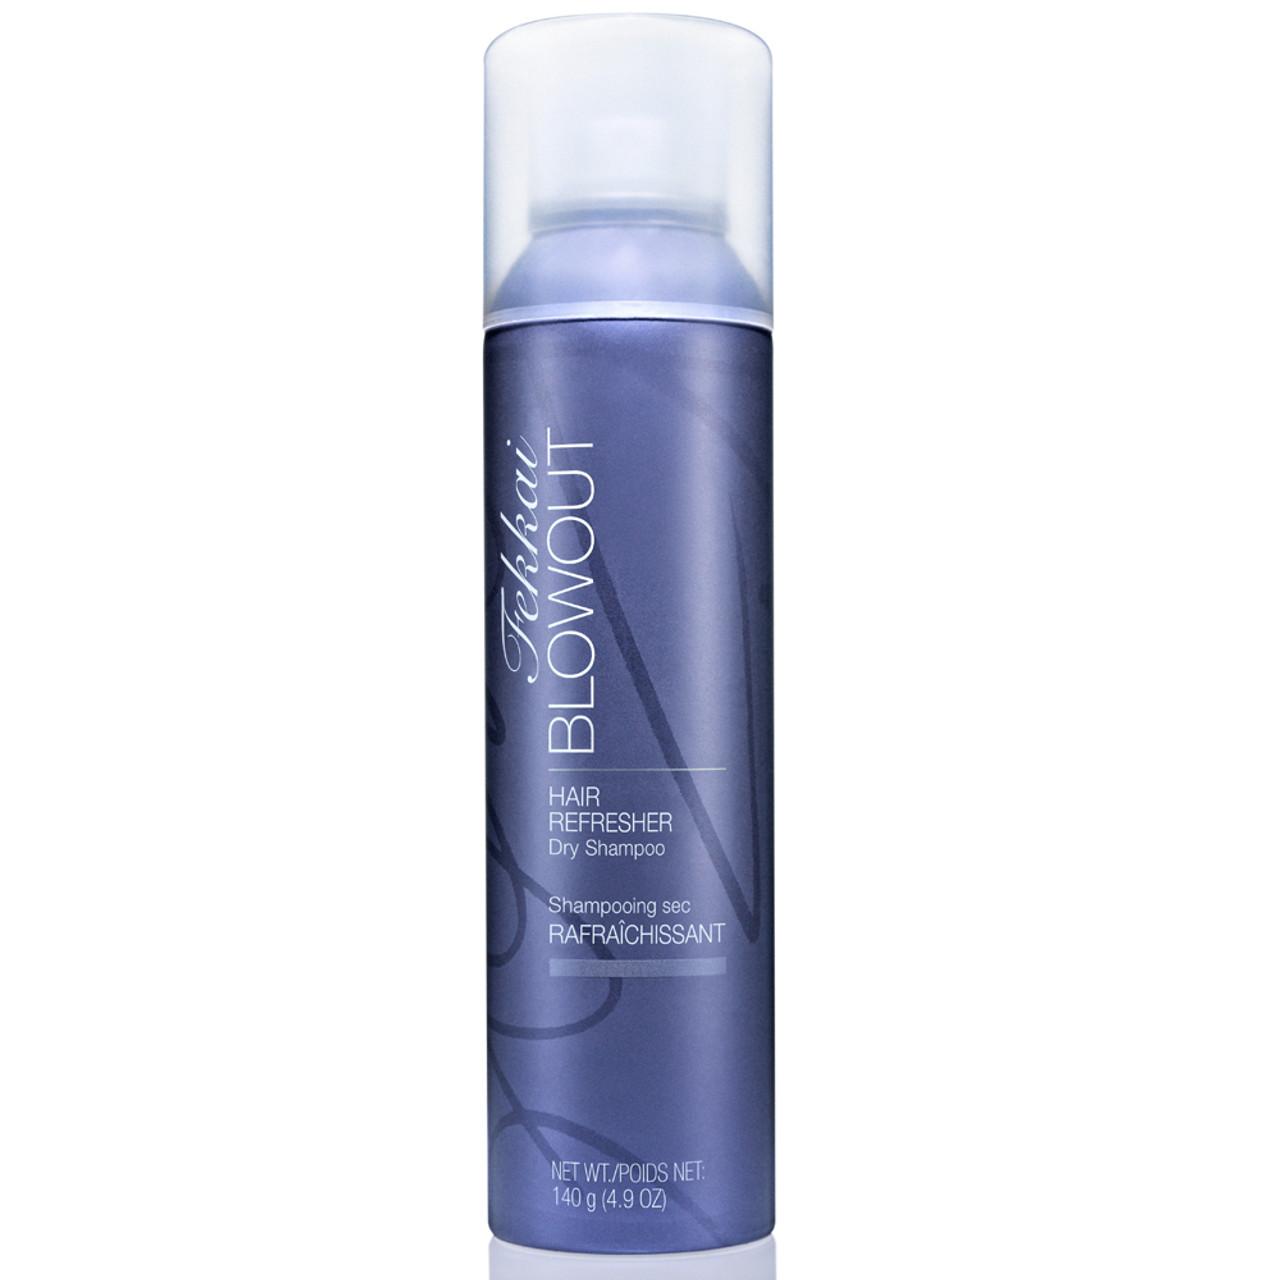 Fekkai Blowout Hair Refresher Dry Shampoo